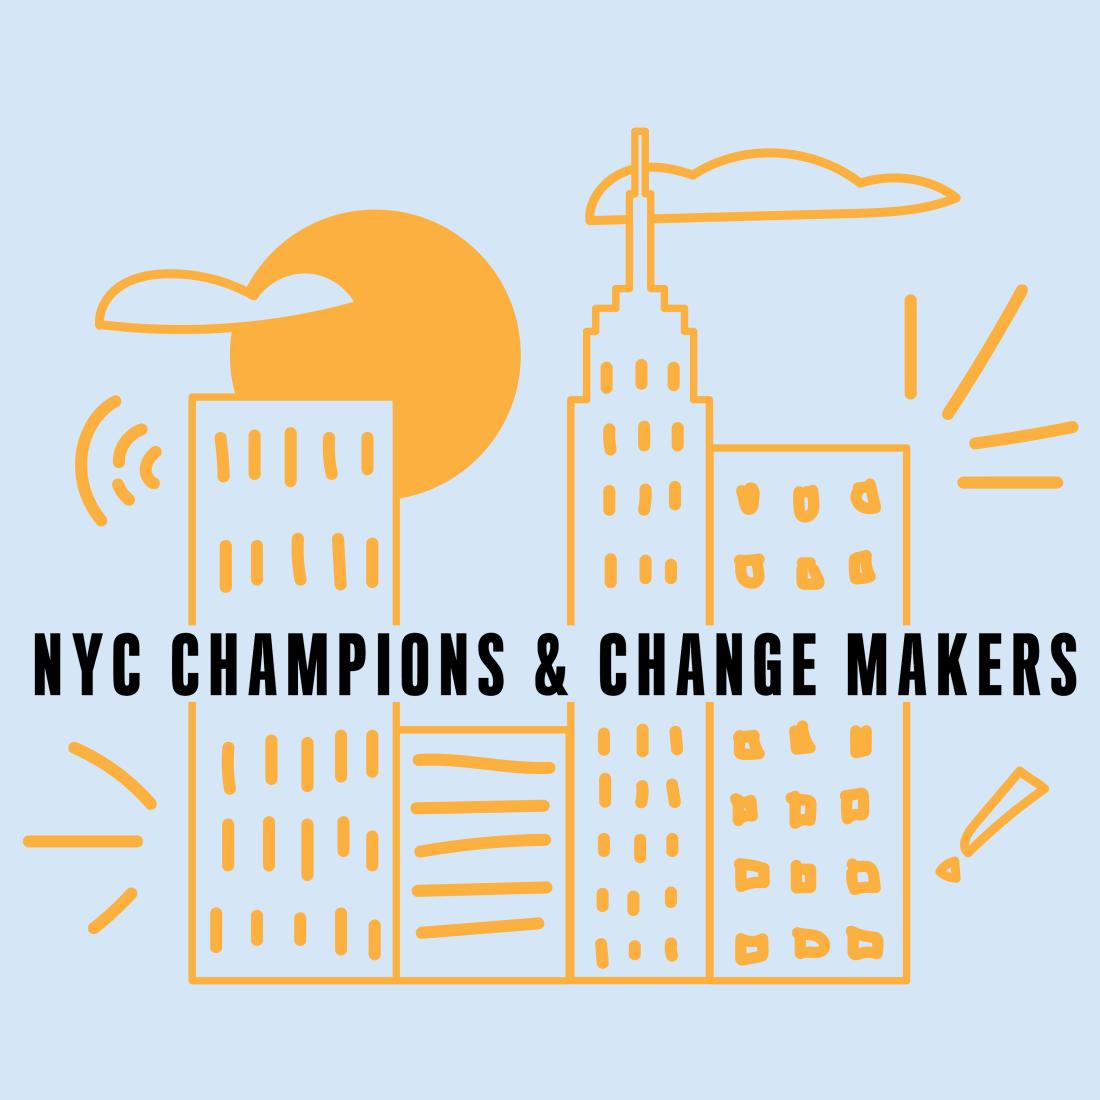 NYC Champions & Change Makers